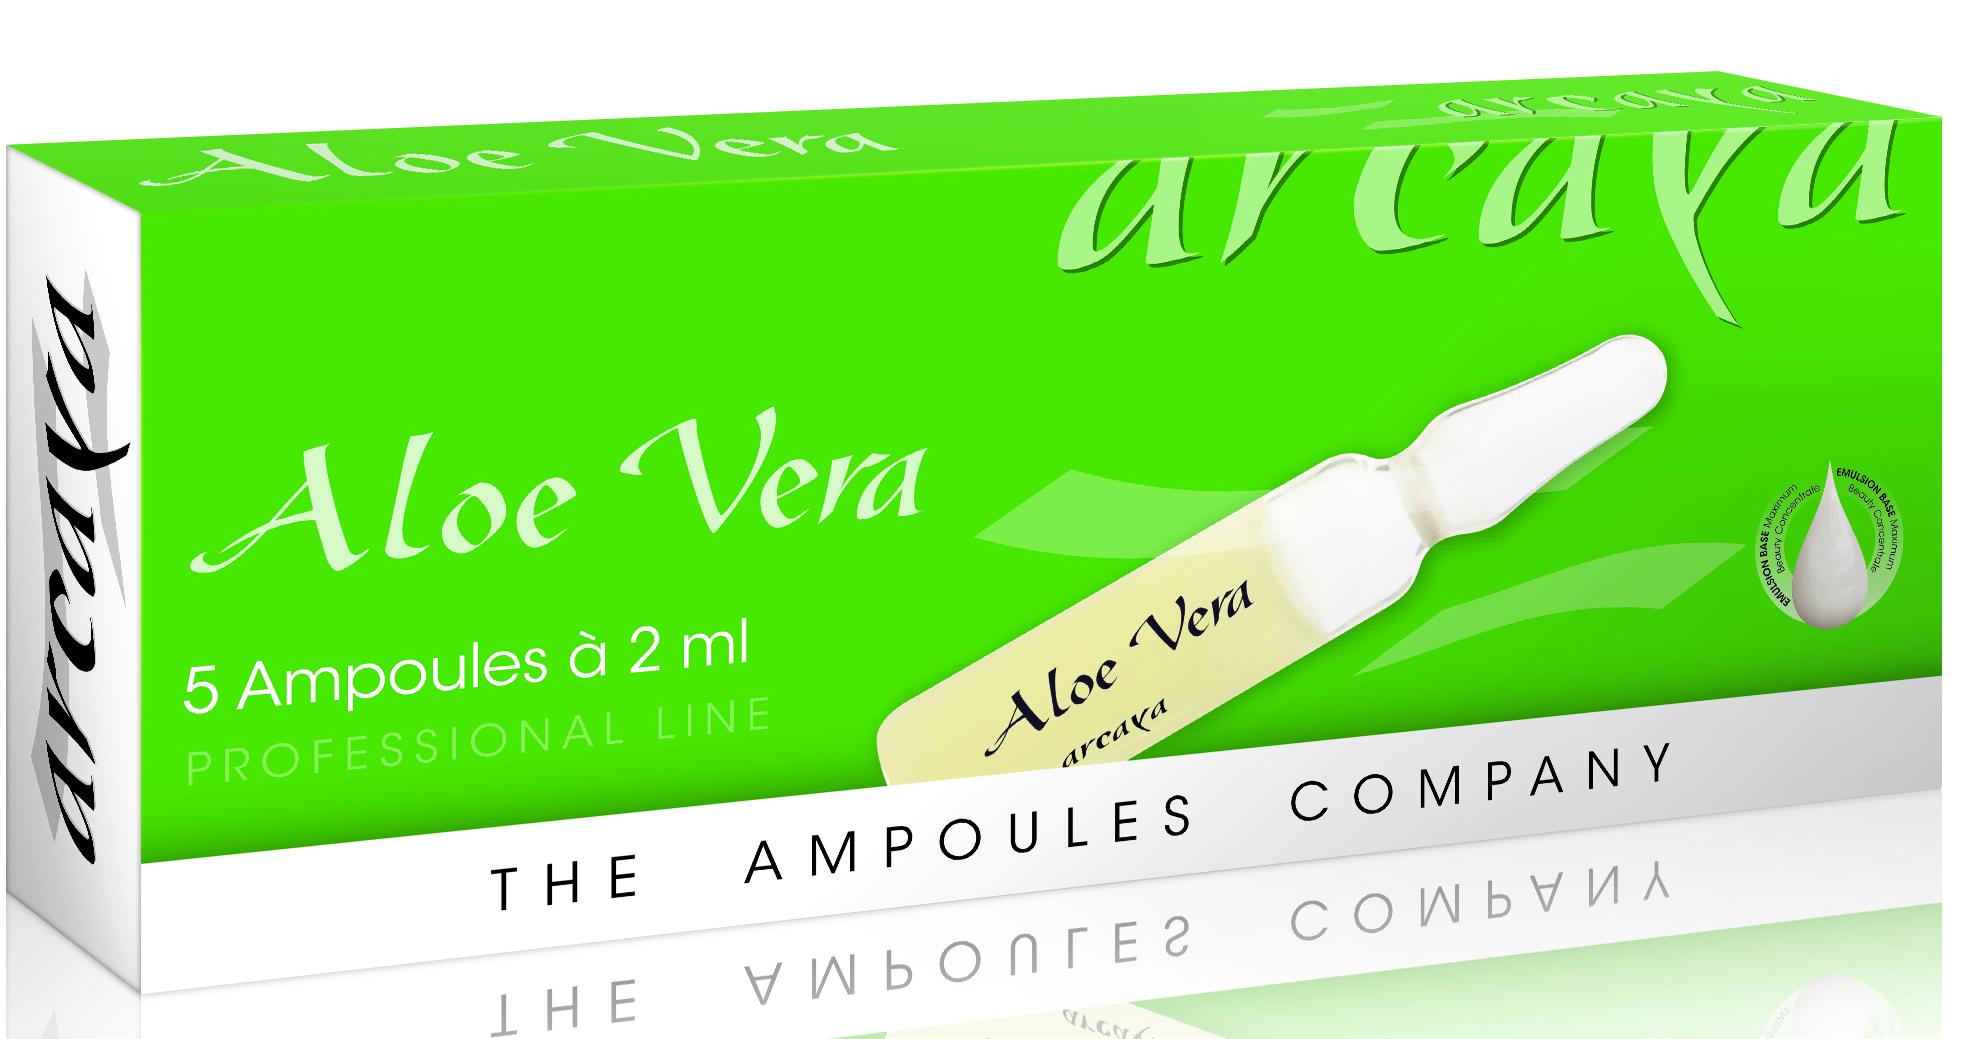 Arcaya Aloe Vera Πλούσια Ενυδάτωση, Αναζωογόνηση & Ανακούφιση από την Αφυδάτωση & την Αίσθηση Τραβήγματος Ampoules 5x2ml